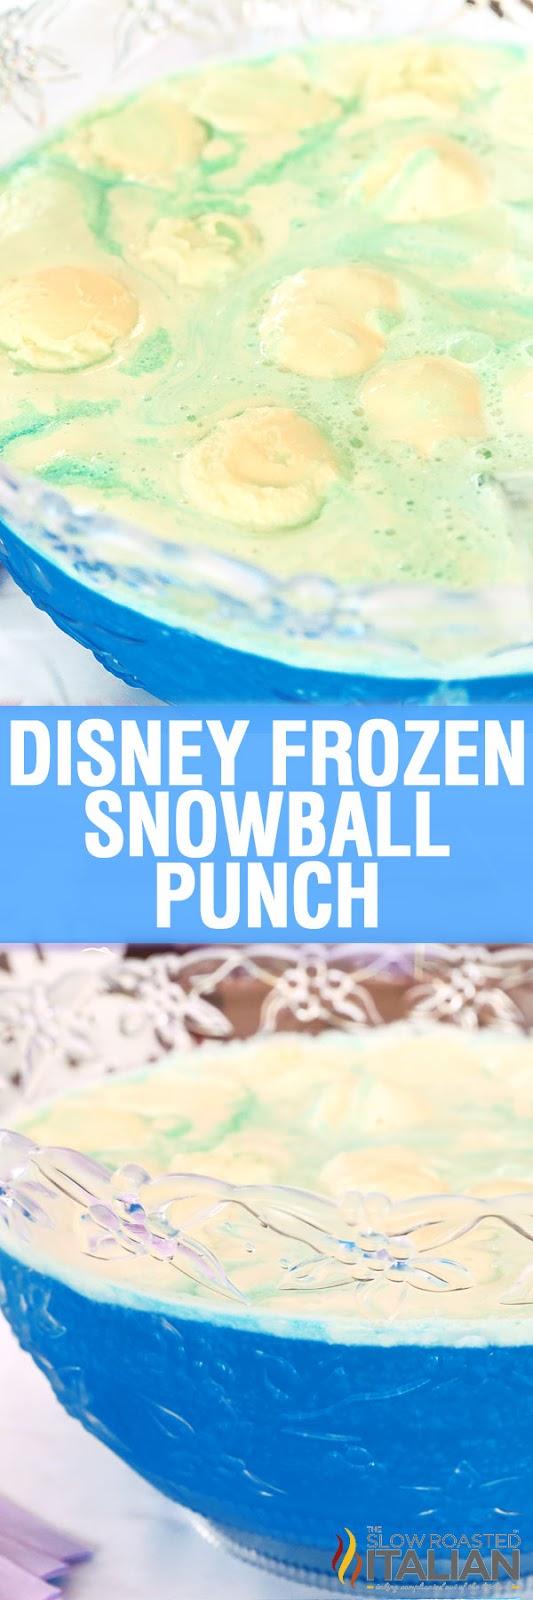 http://www.theslowroasteditalian.com/2016/05/disney-frozen-snowball-punch-recipe.html